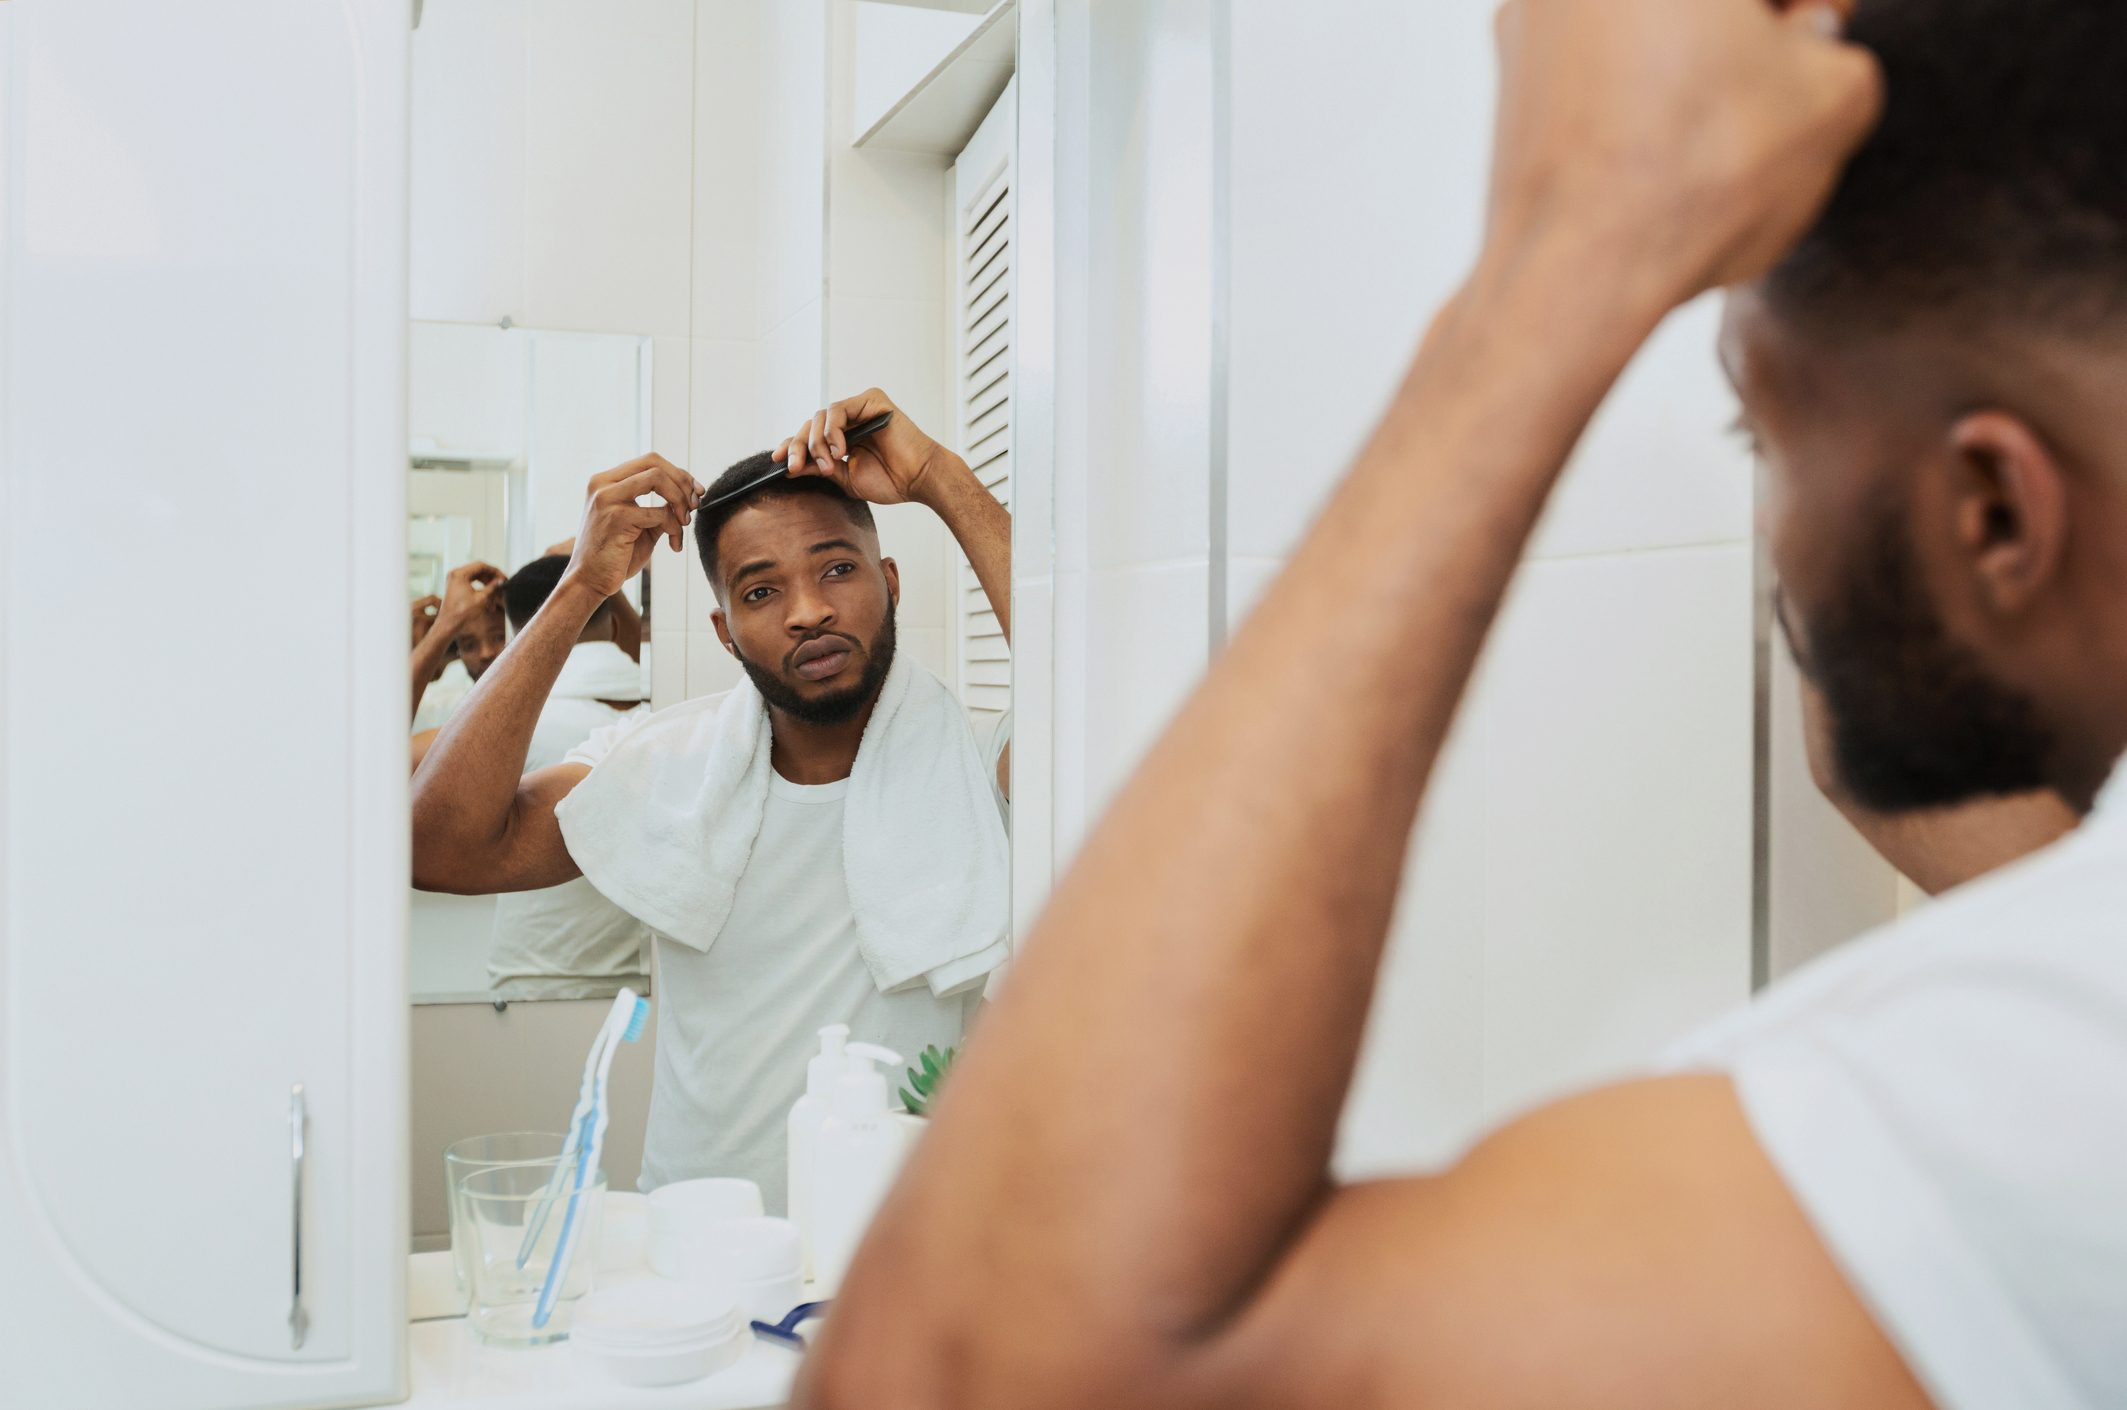 man examining hair in bathroom mirror